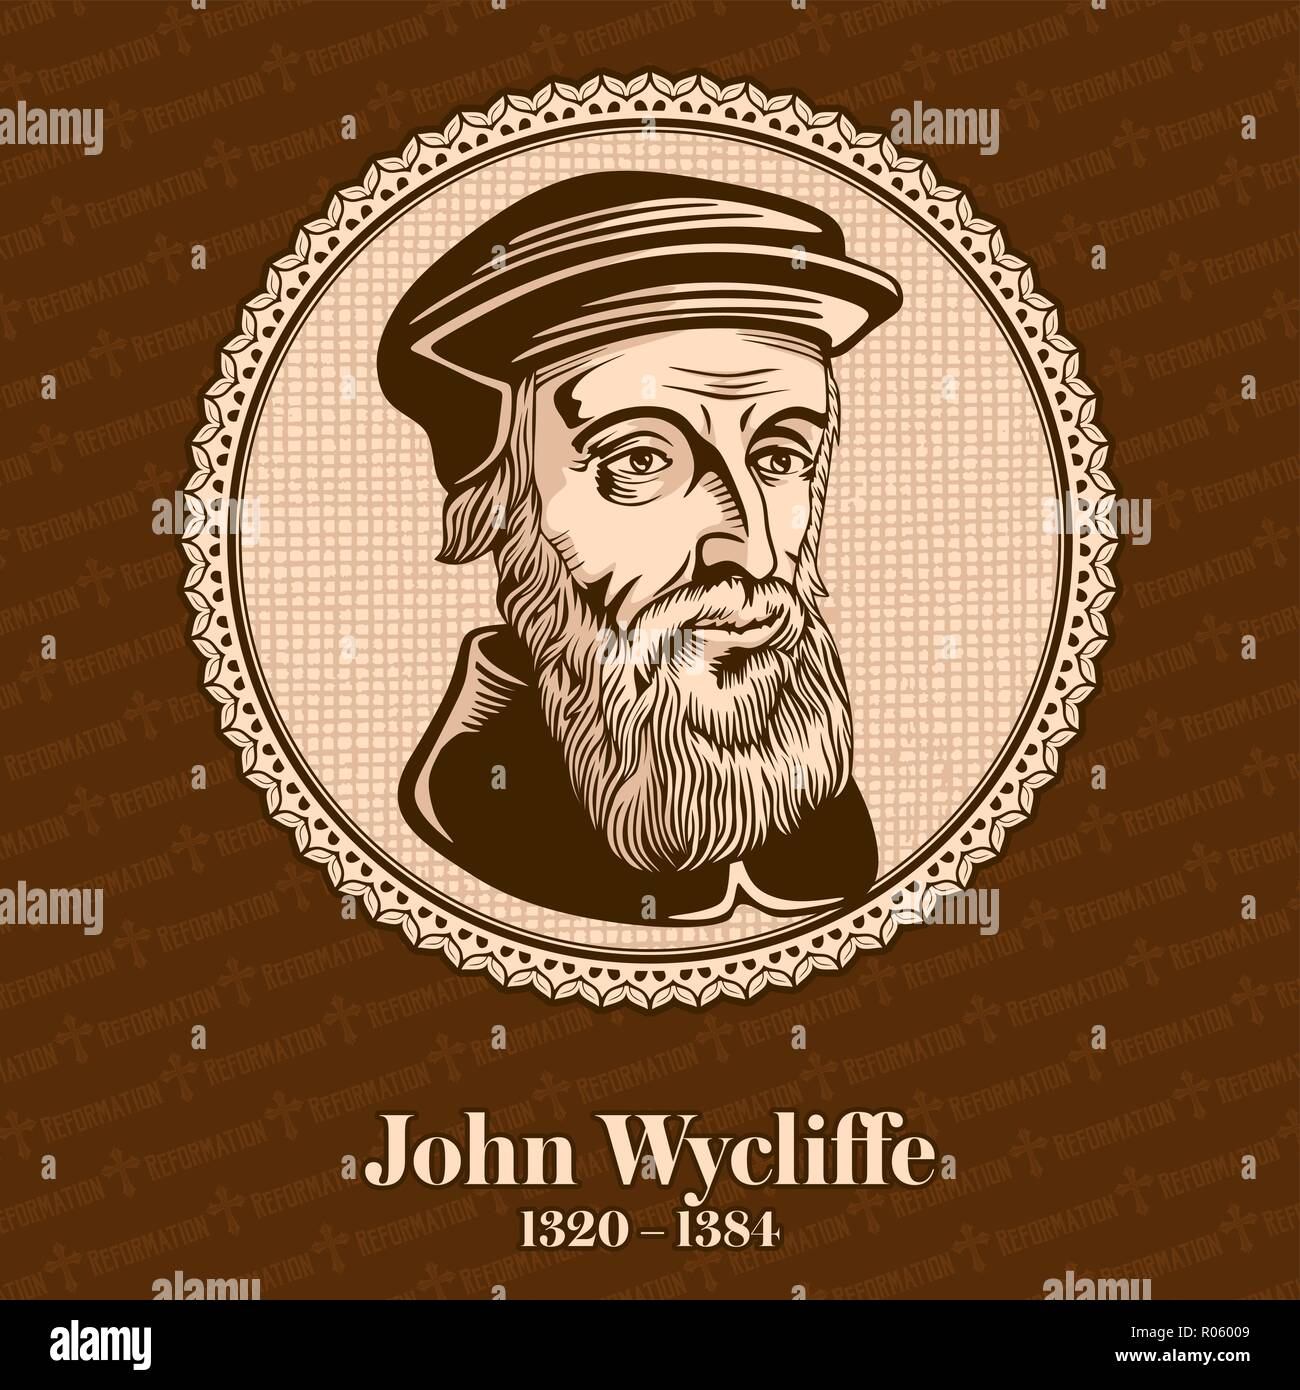 John Wycliffe (1320 – 1384) was an English scholastic philosopher, theologian, Biblical translator, reformer, English priest, and a seminary professor - Stock Image